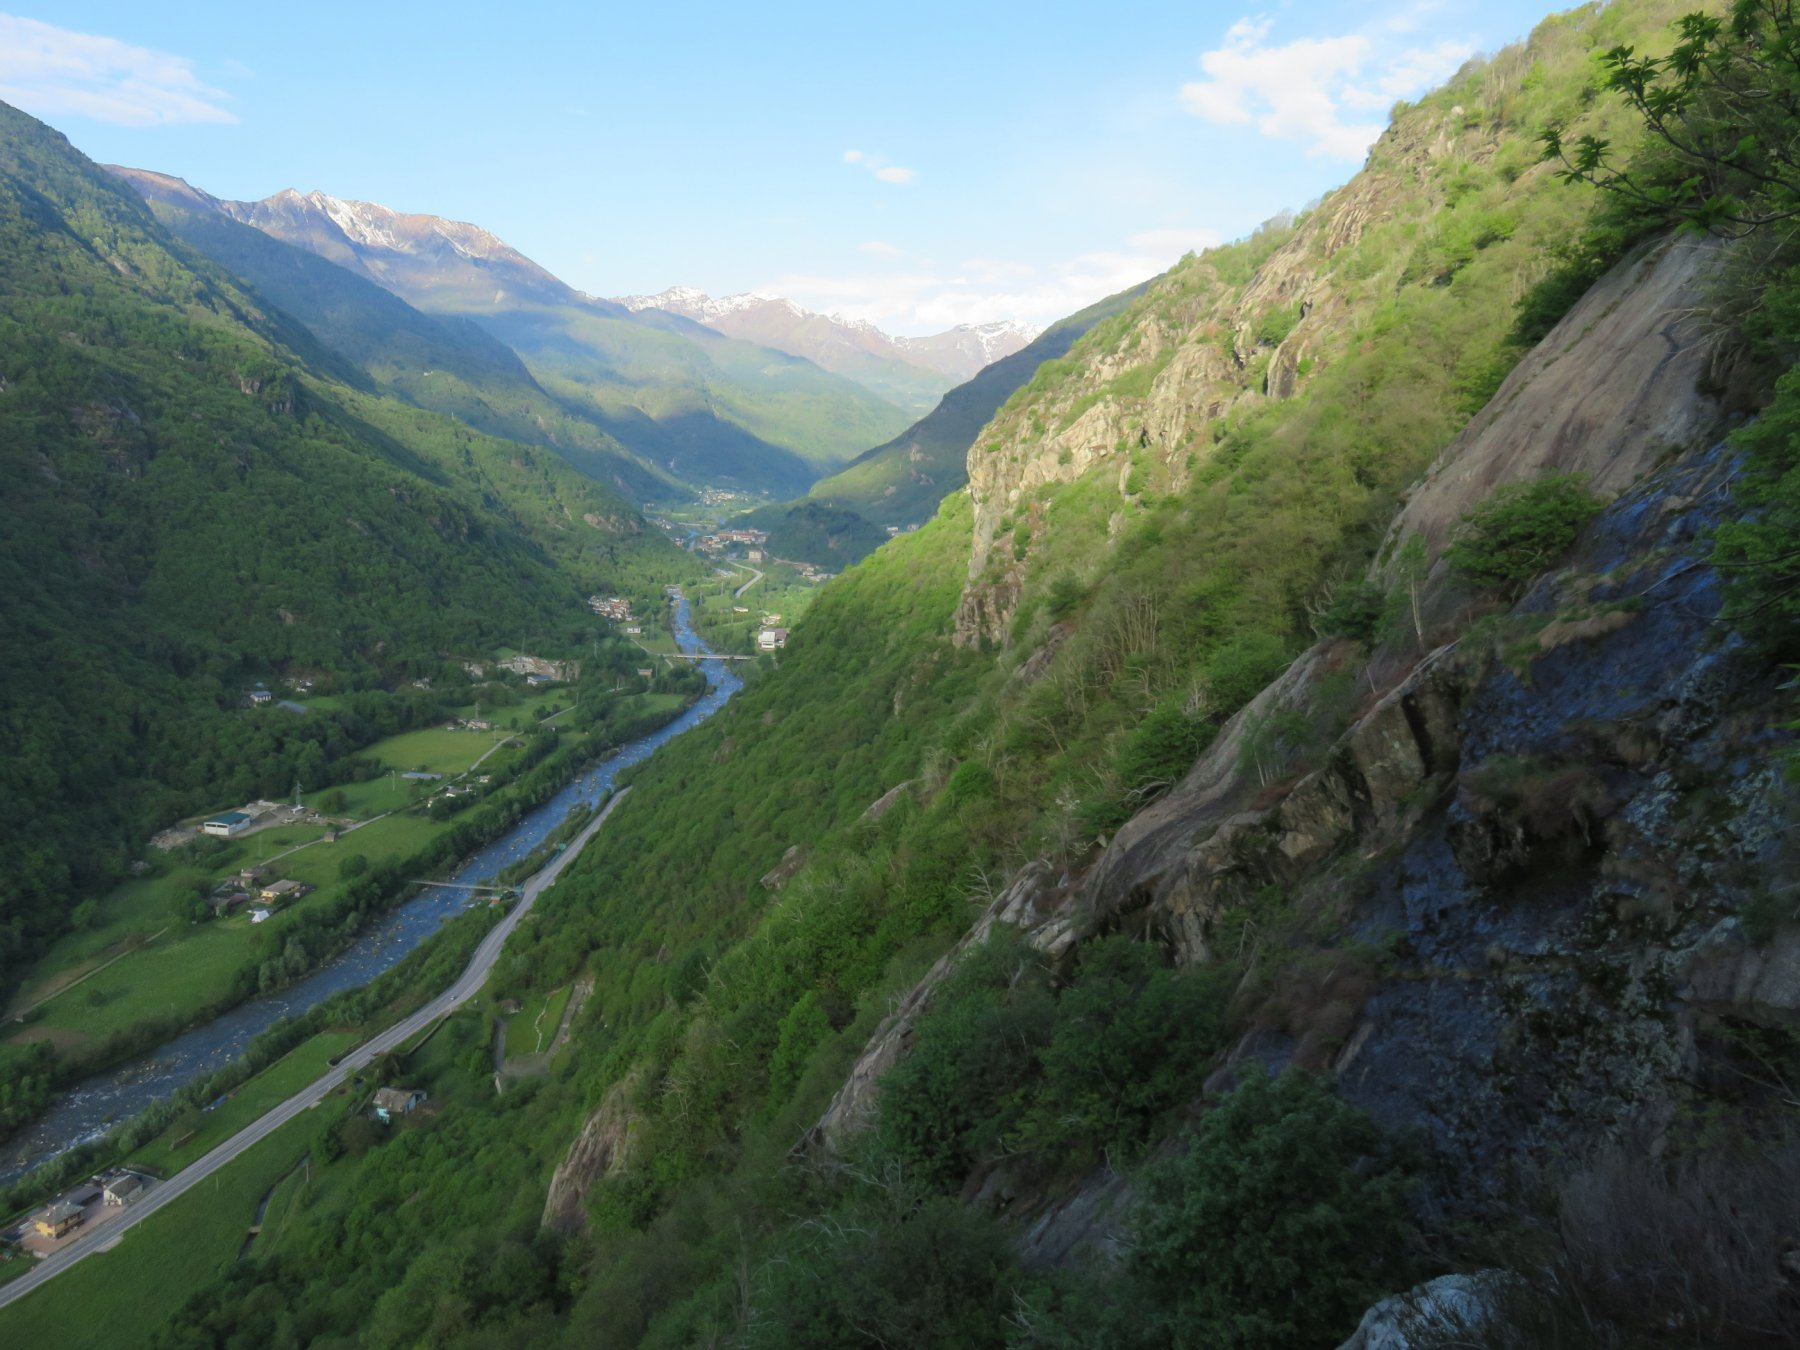 Valle dell'Orco, salendo a Piancerese